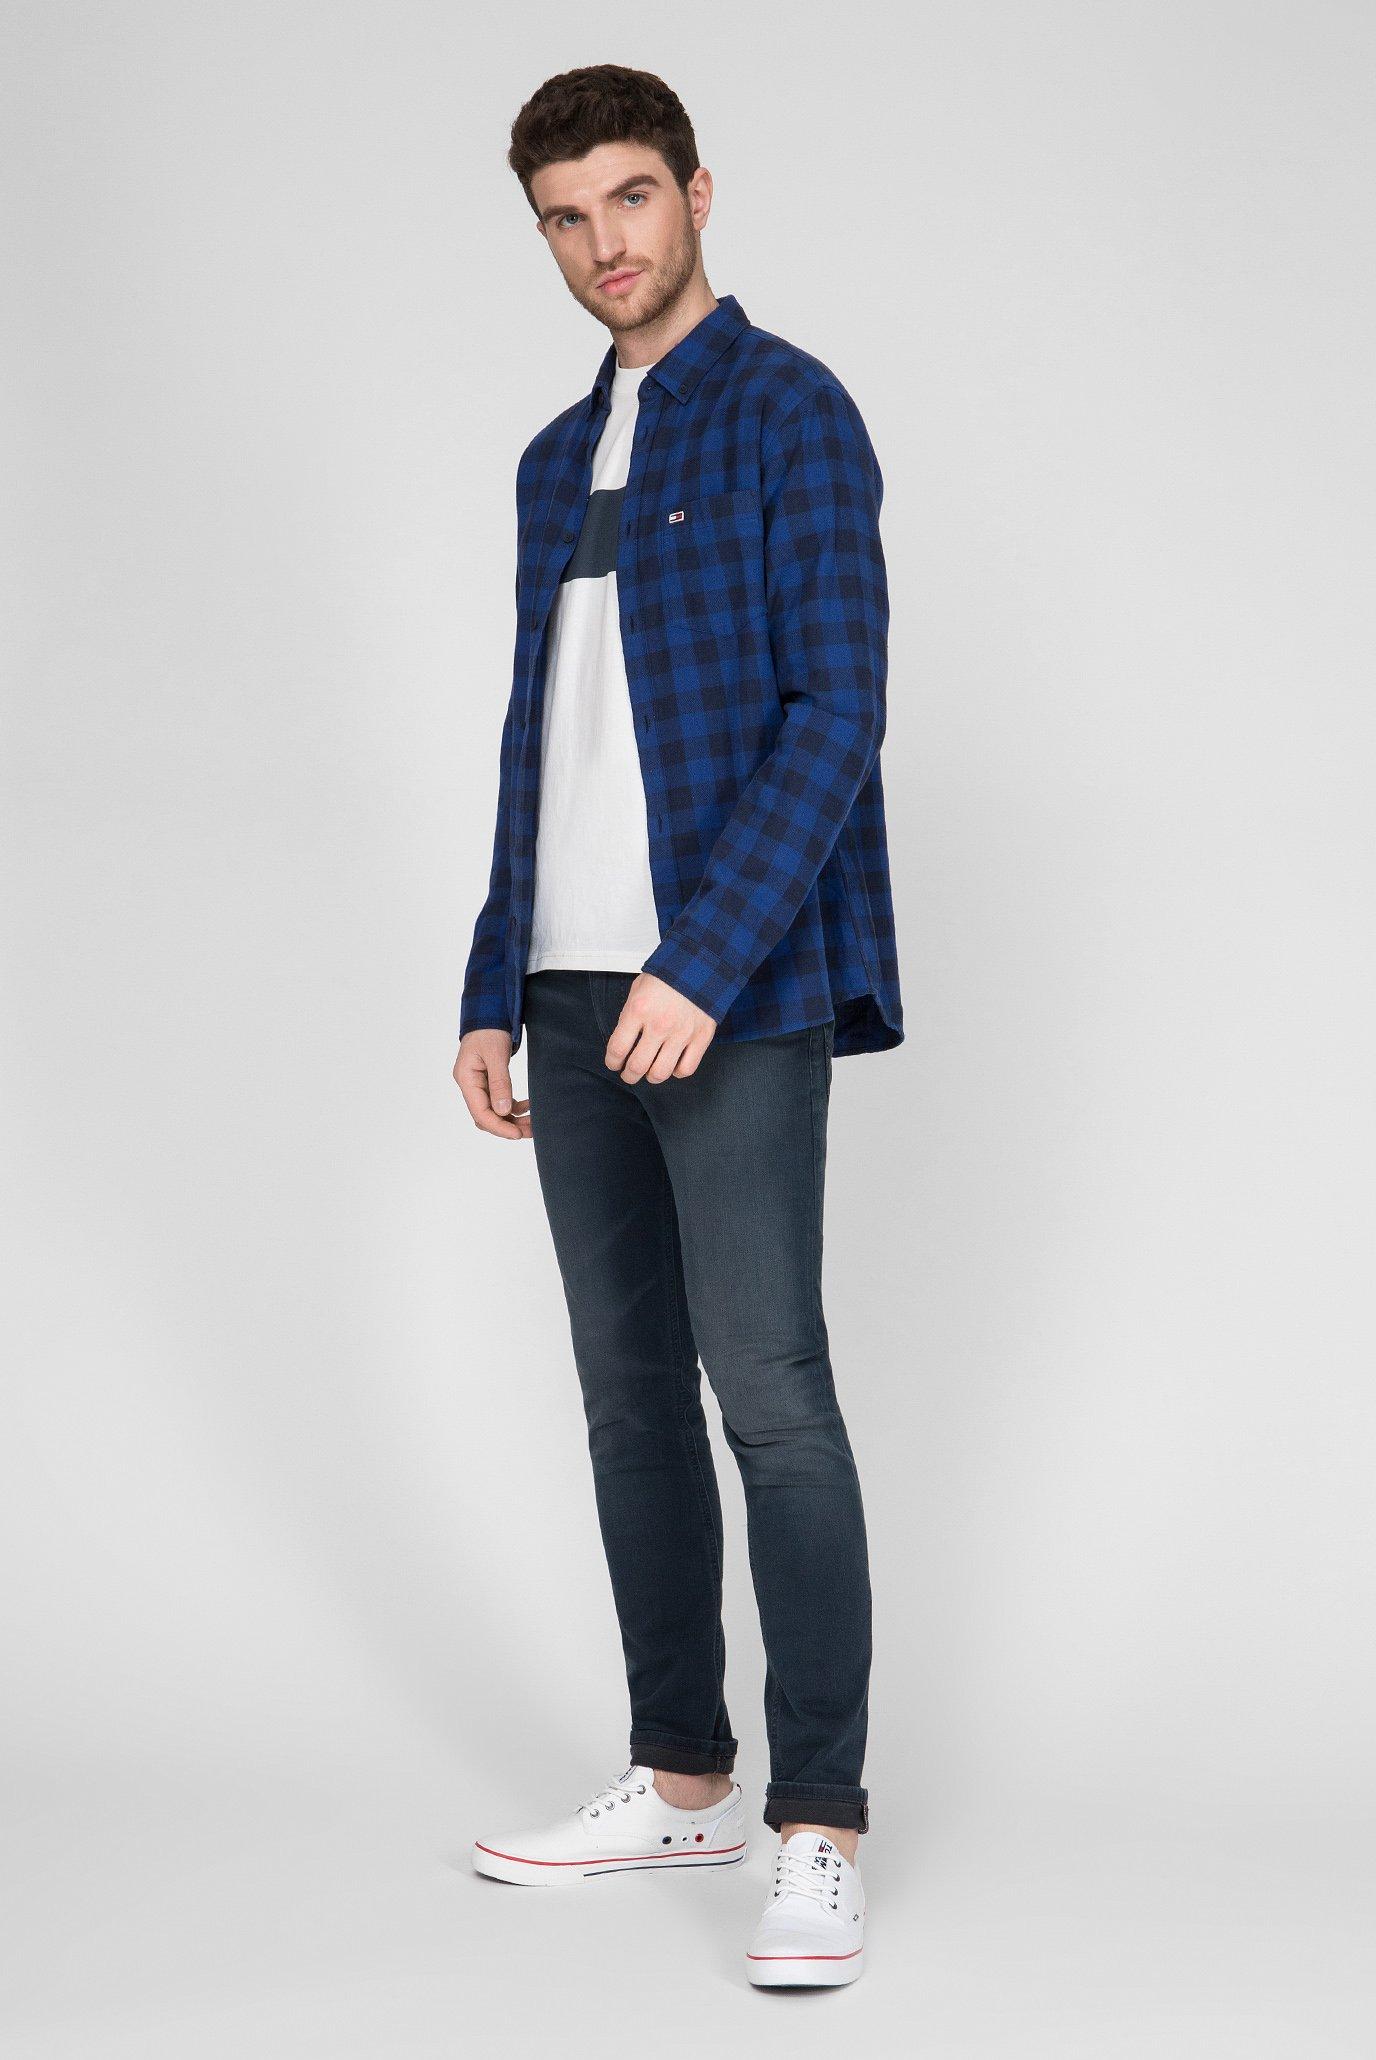 Мужская синяя рубашка в клетку TJM SUSTAINABLE Tommy Hilfiger